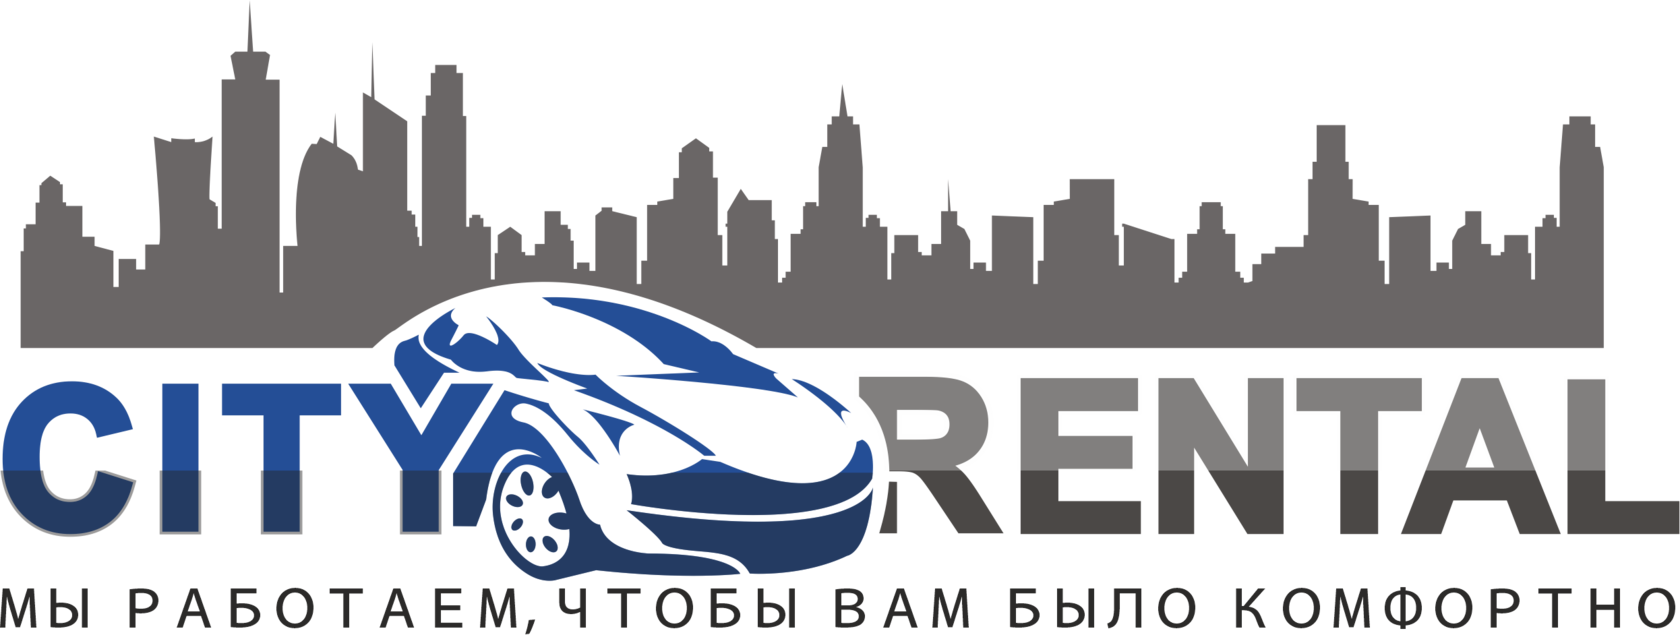 CityRental